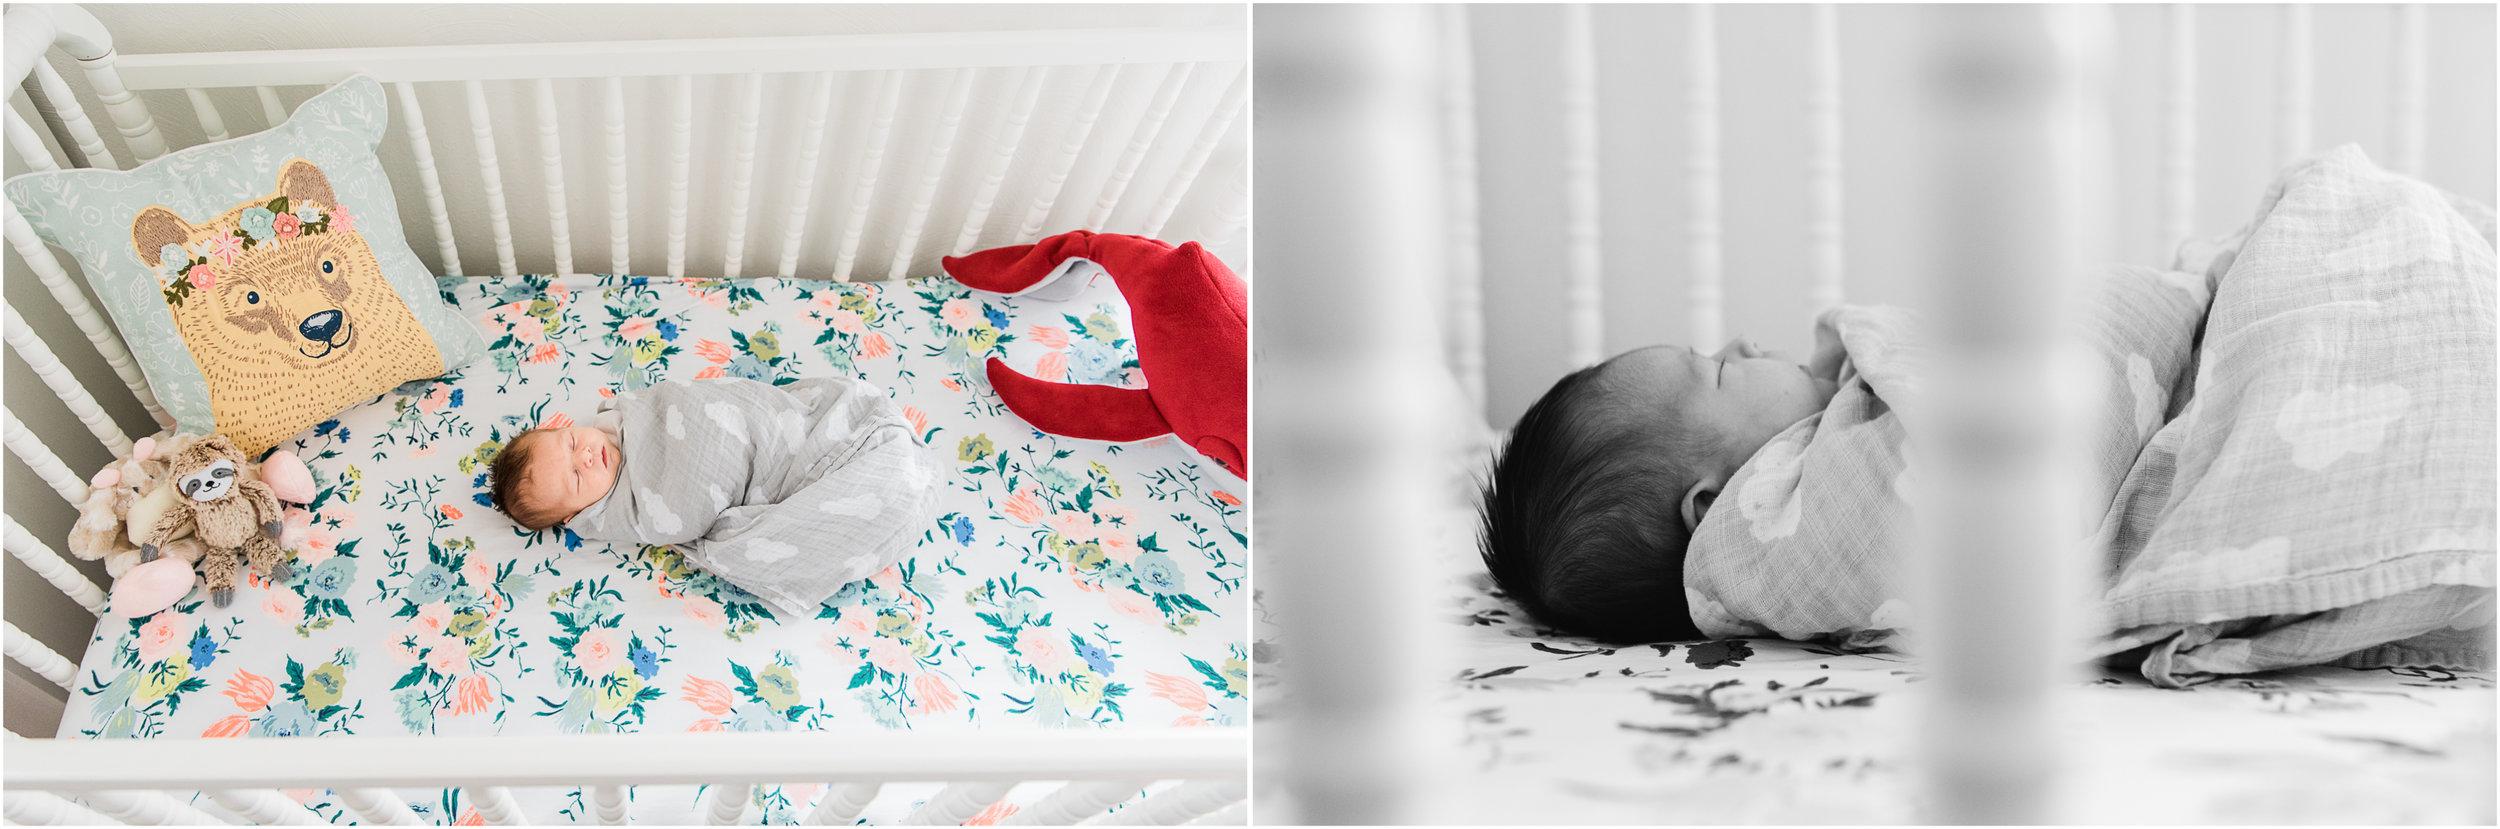 Pittsburgh PA lifestyle session, newborn photographer Mariah Fisher.jpg